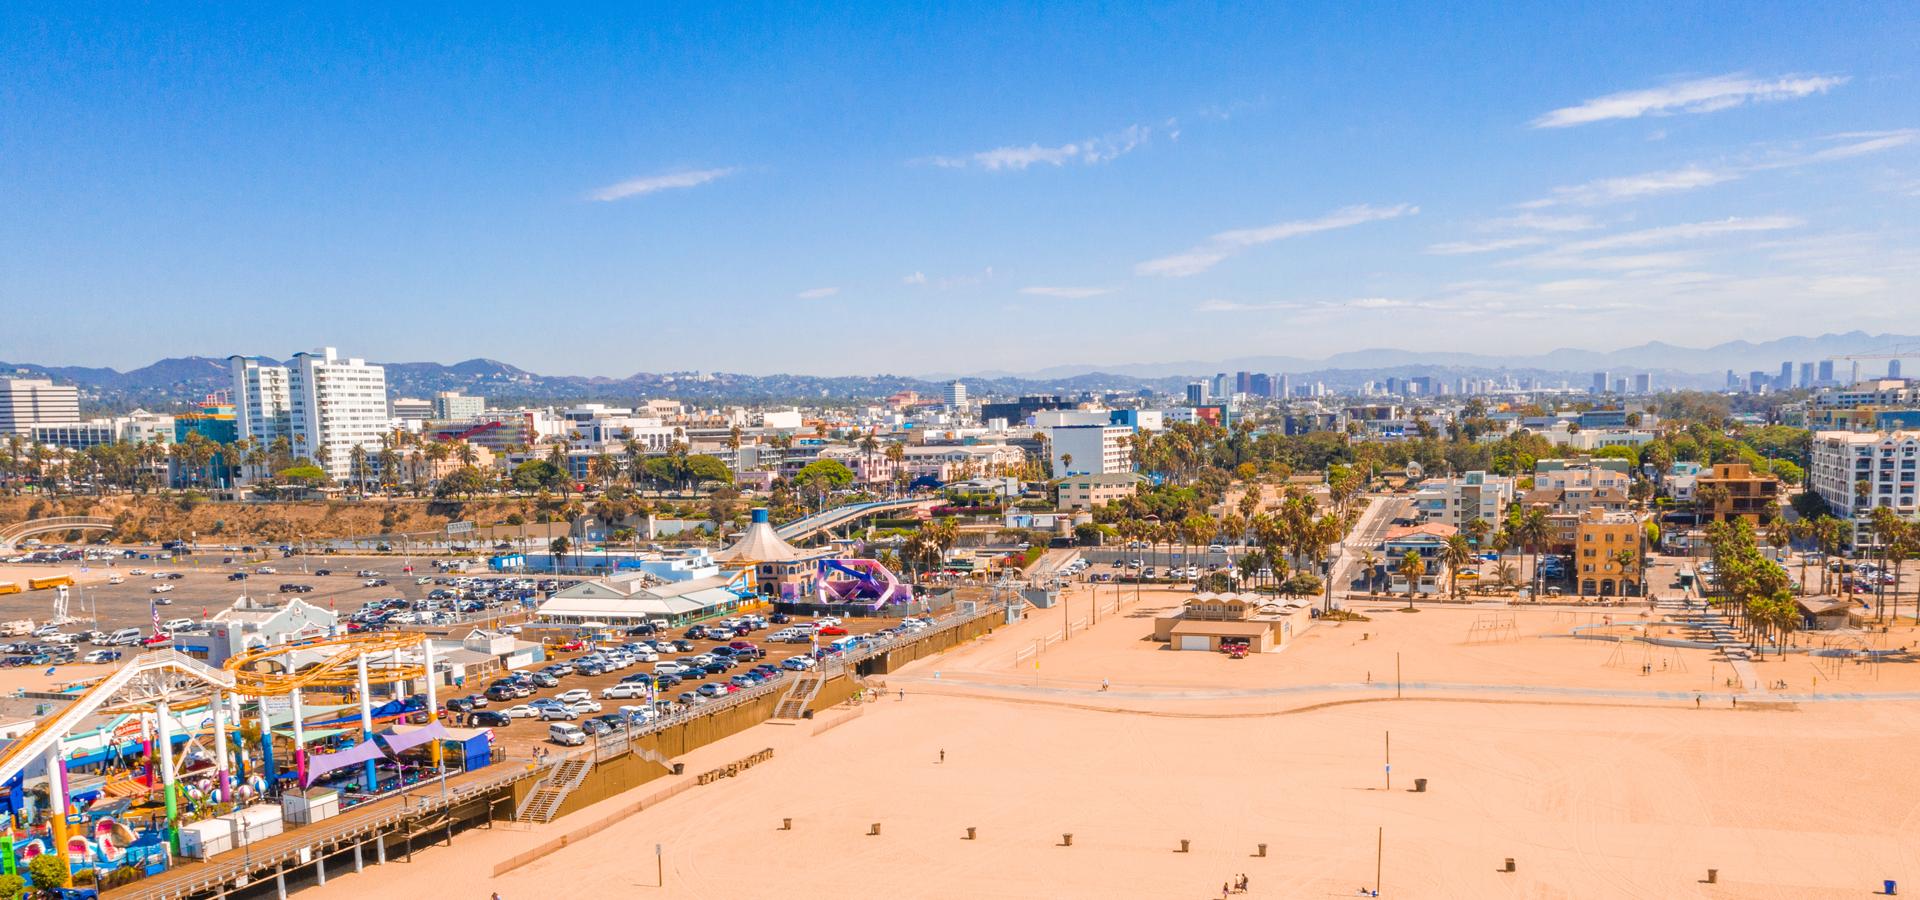 Peer-to-peer advisory in Santa Monica, California, USA